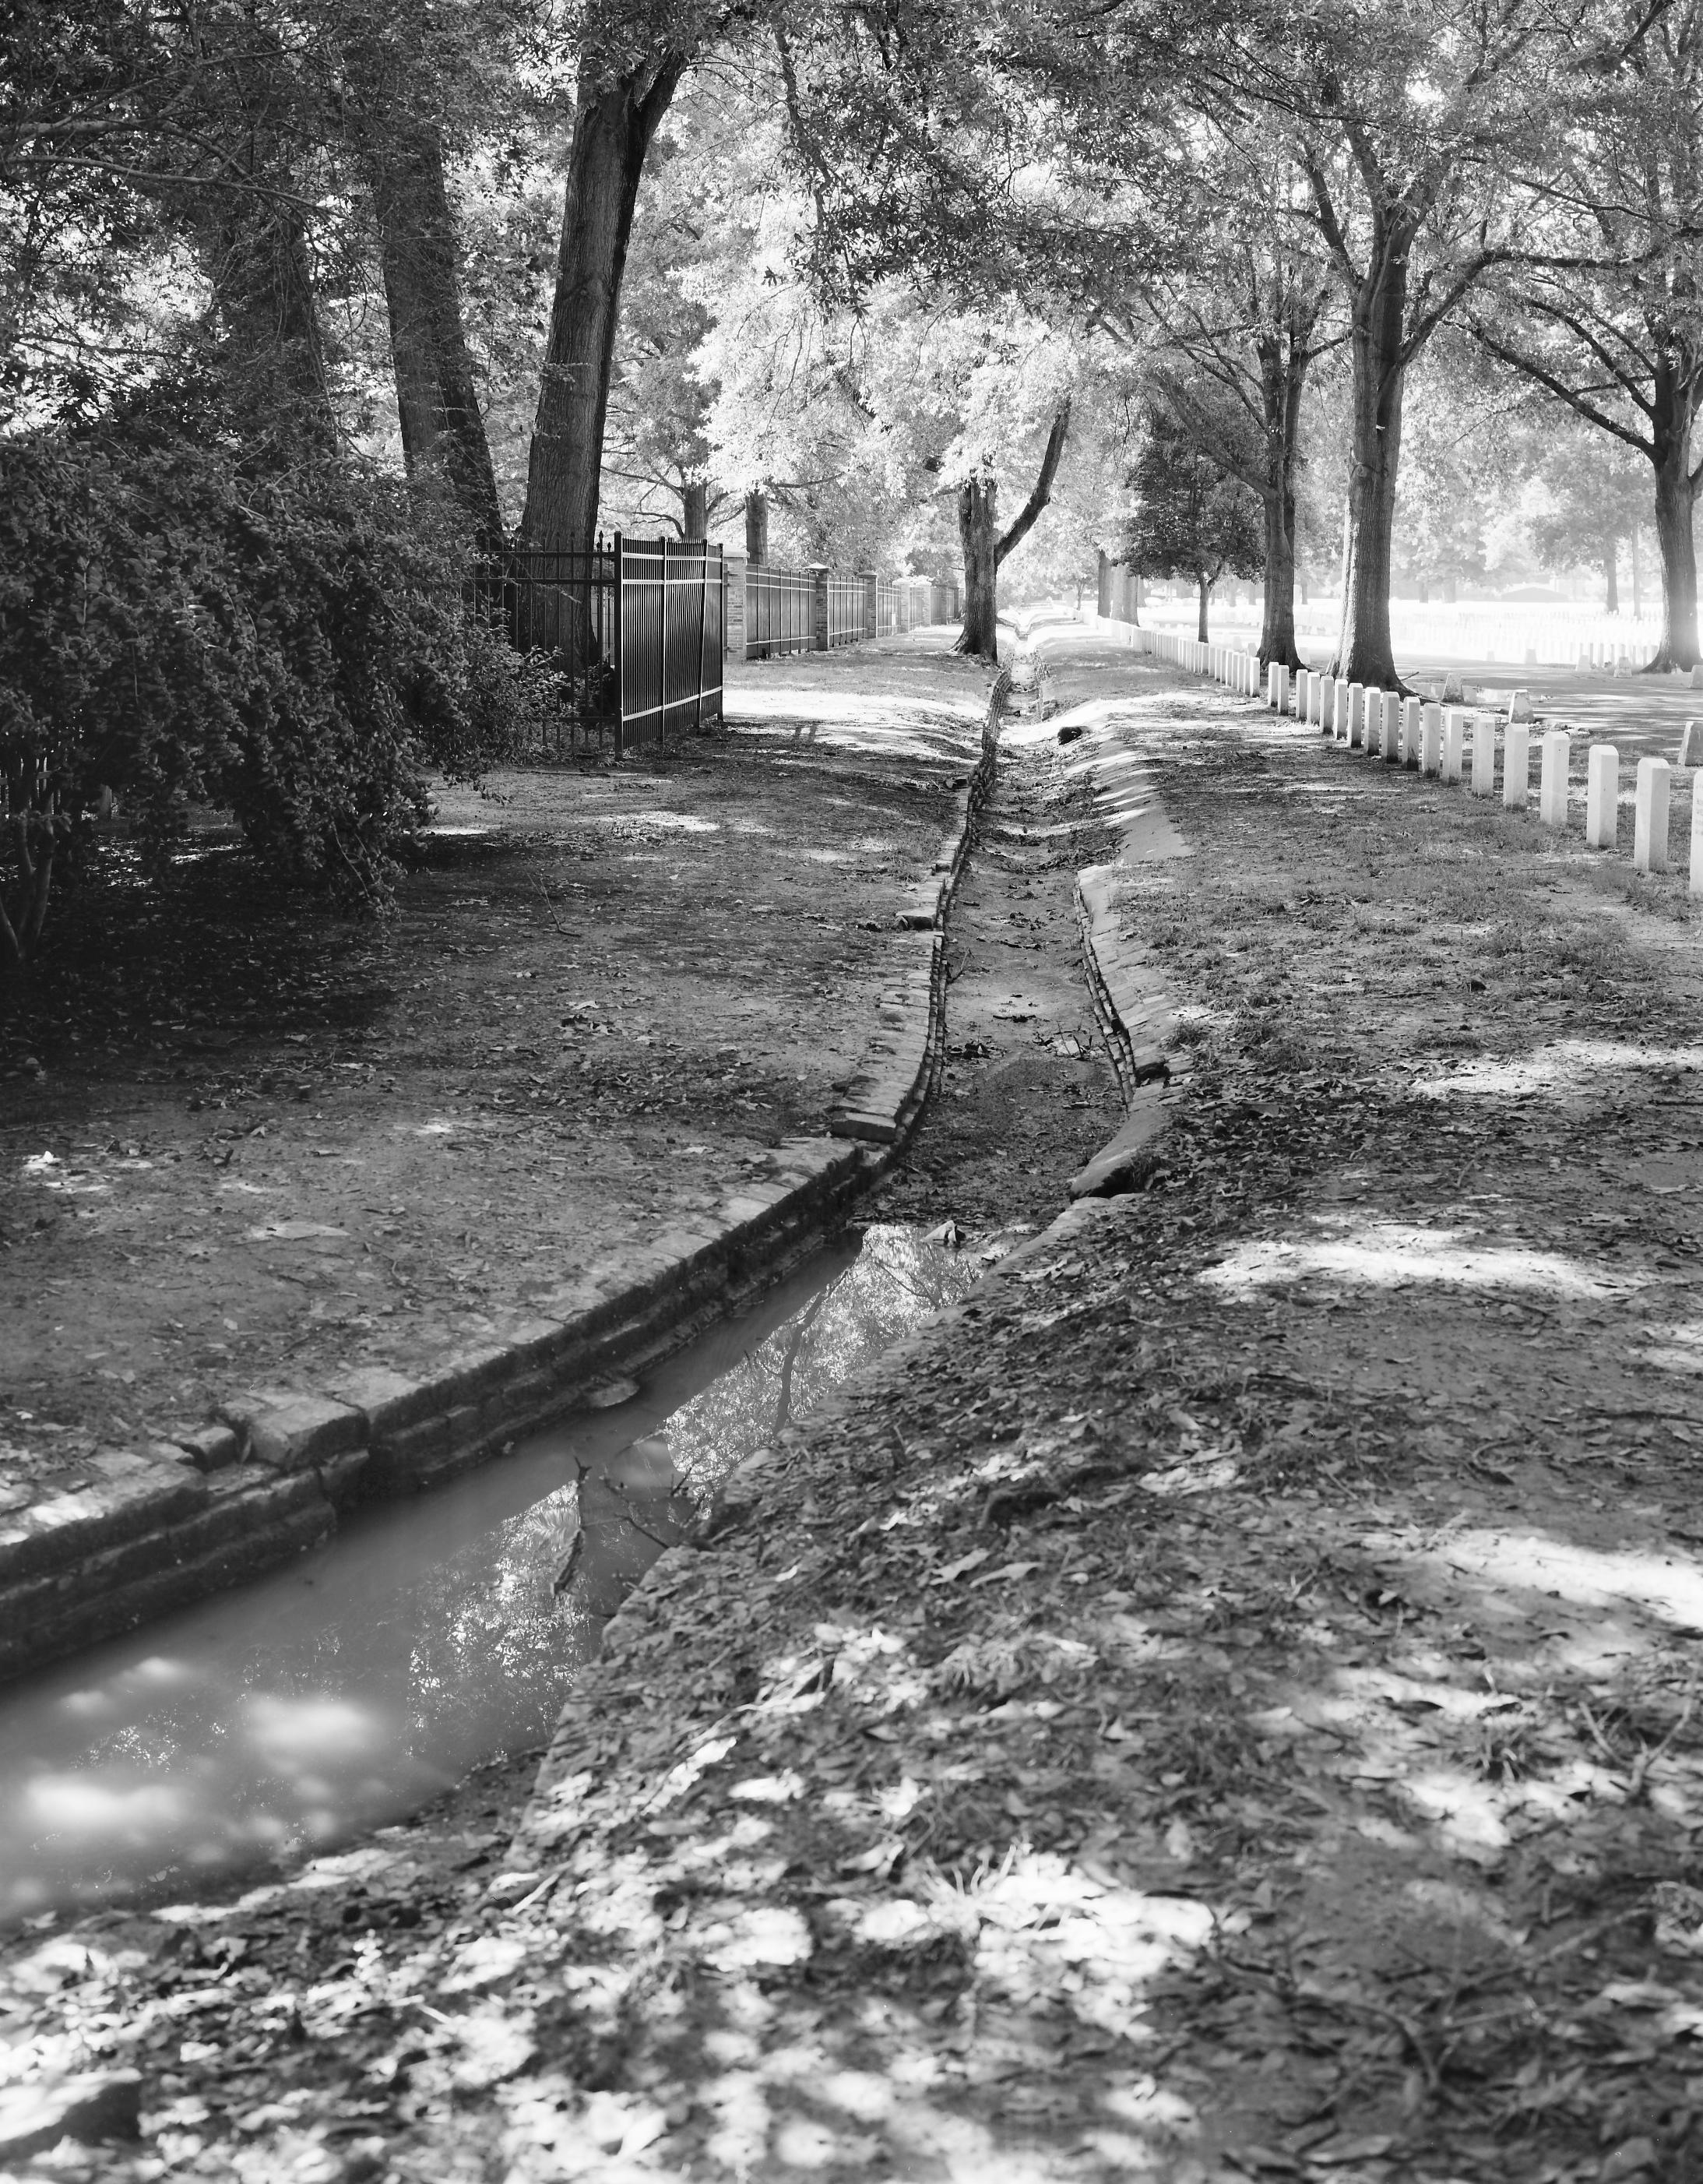 Brick Drainageway - HALS TN-3-90 (Please credit Daniel R. Pratt and the Historic American Landscapes Survey)